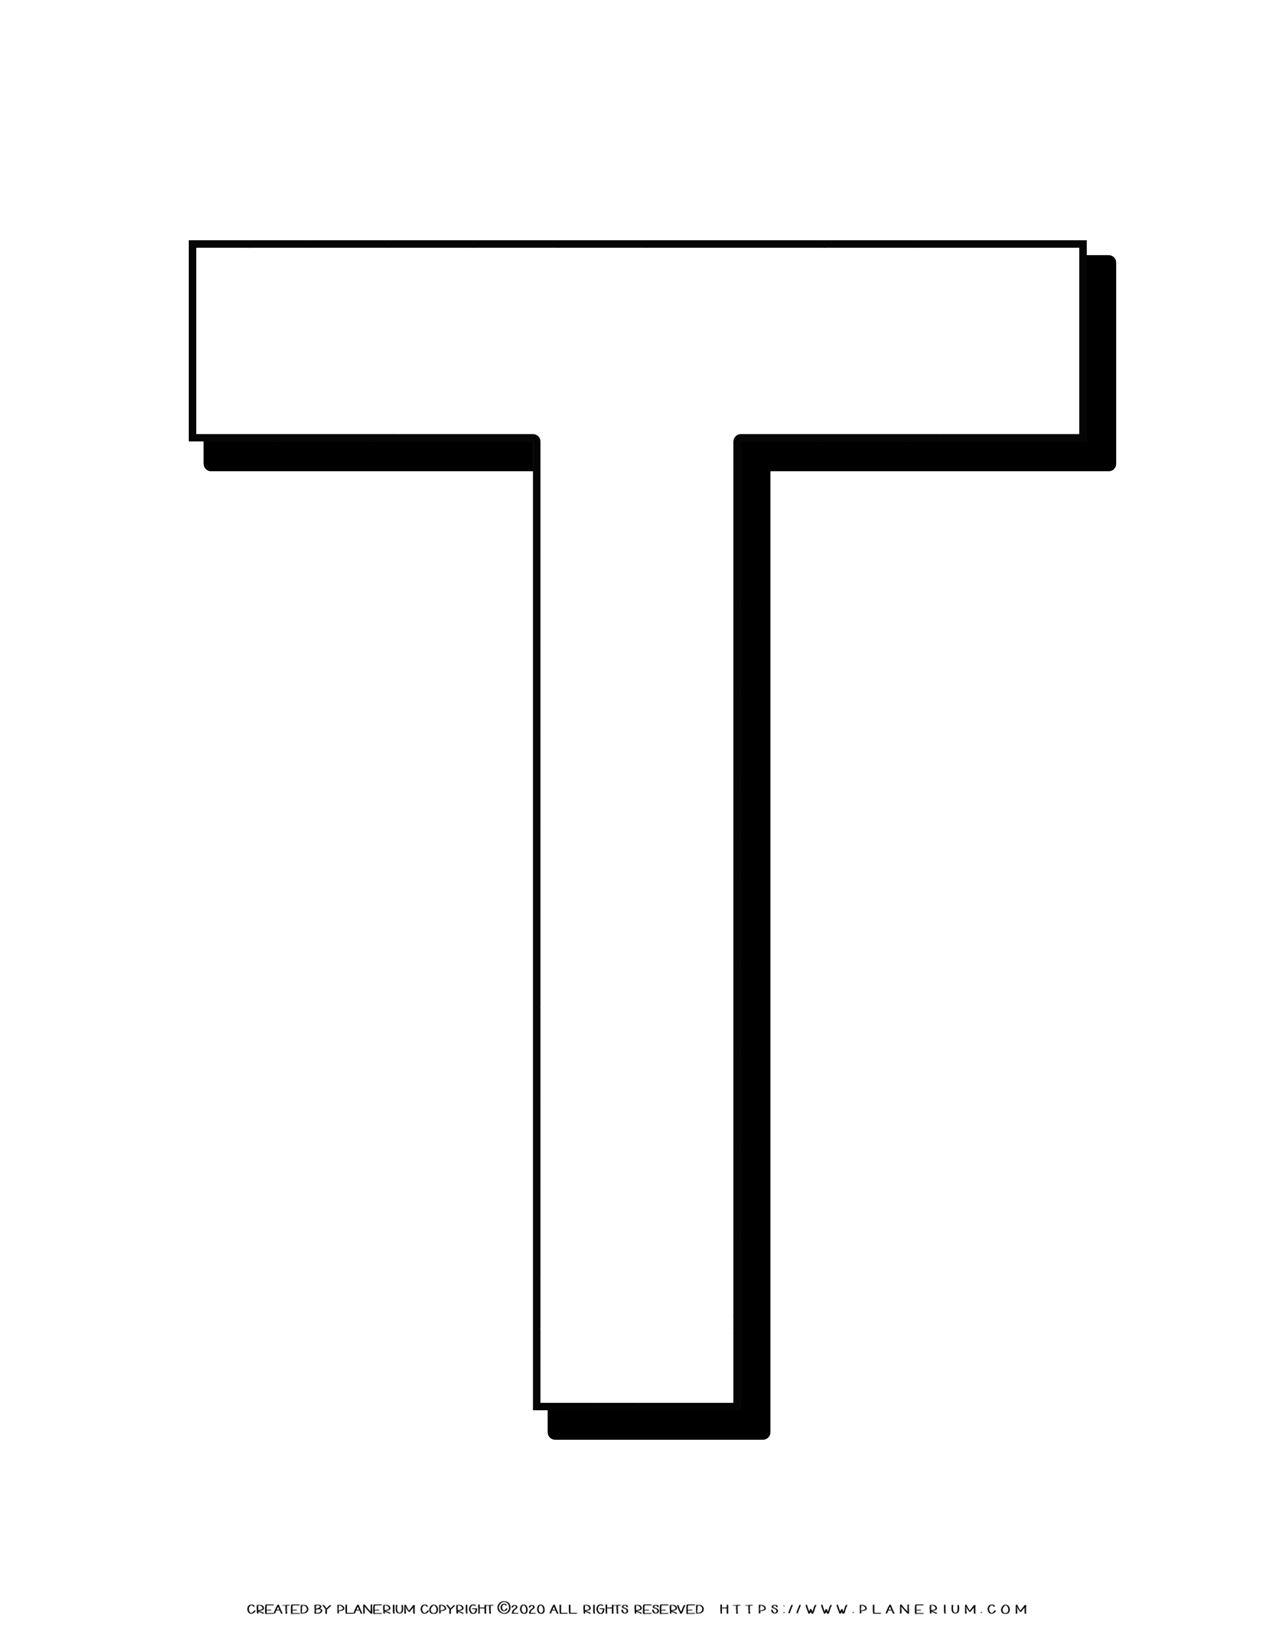 Alphabet Coloring Pages - English Letters - Capital T | Planerium